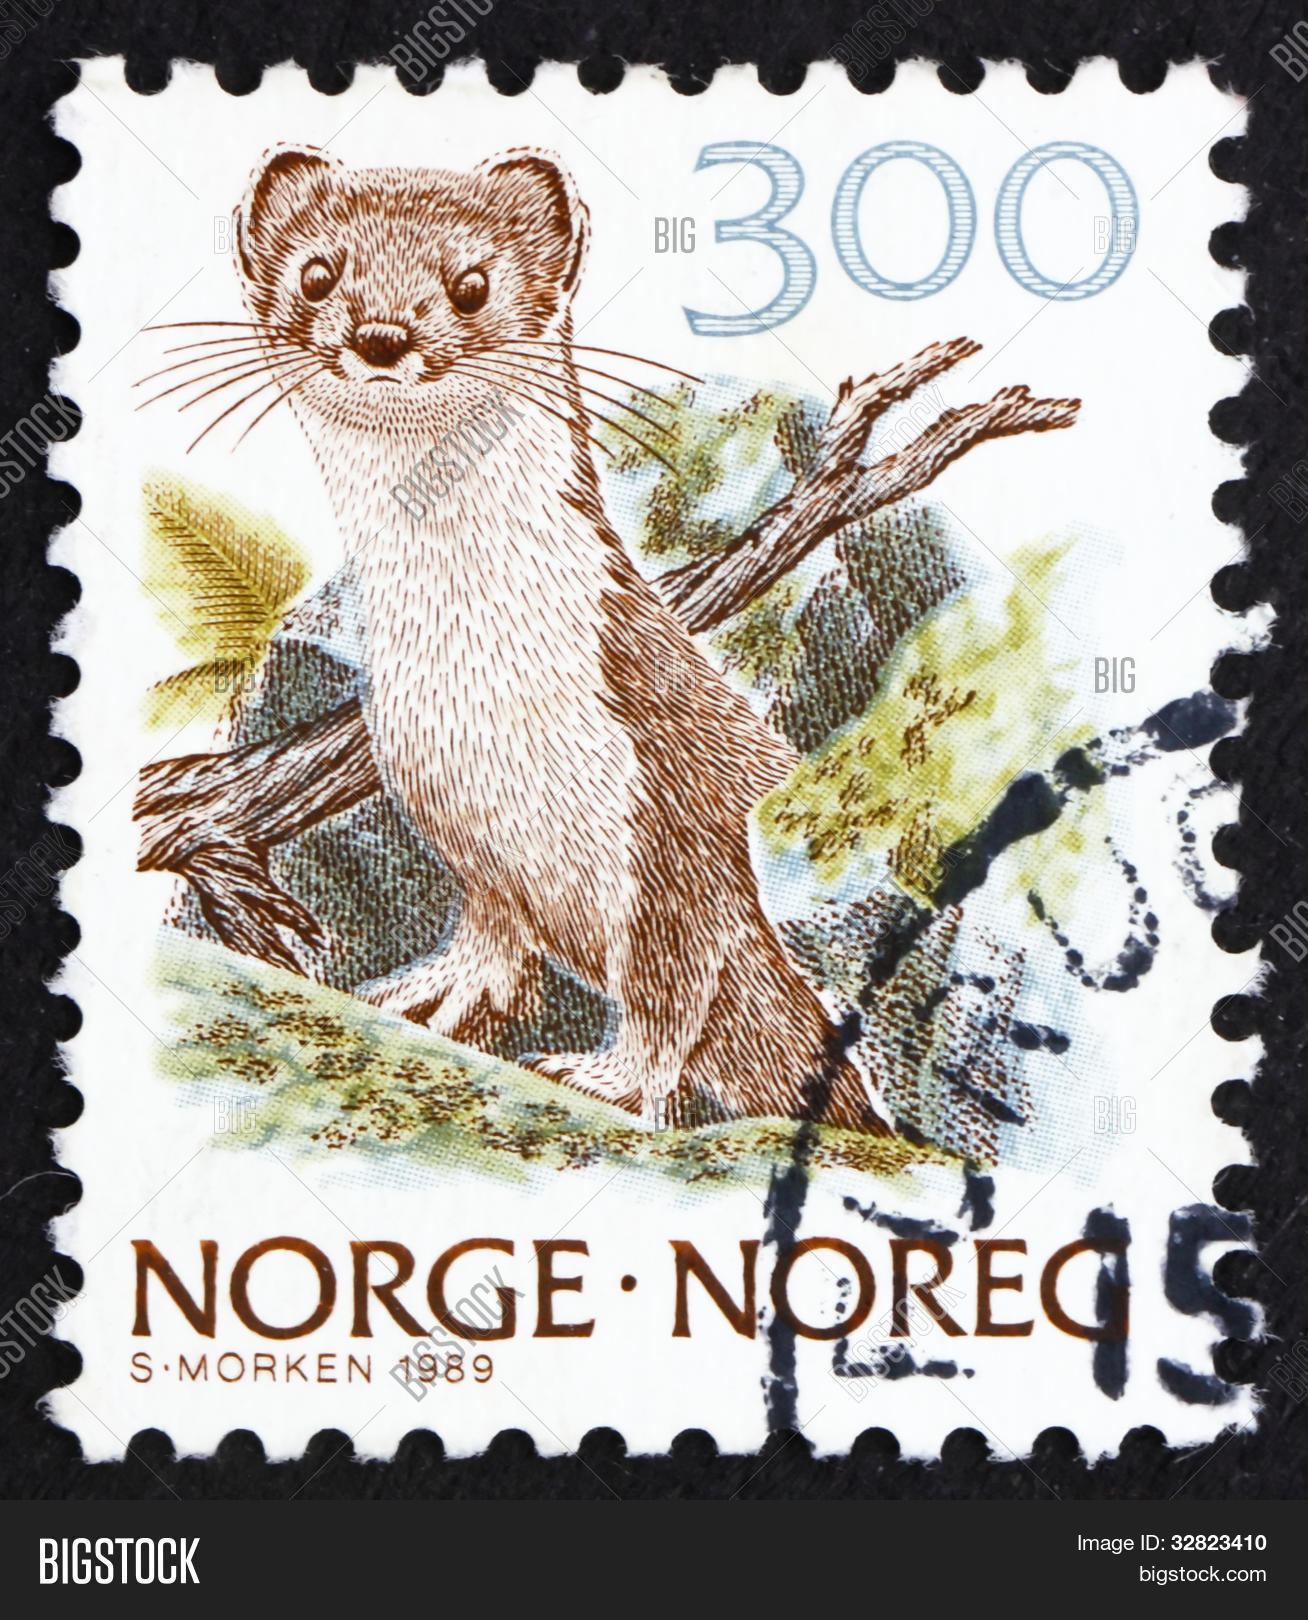 Postage Stamp Norway Image & Photo (Free Trial) | Bigstock